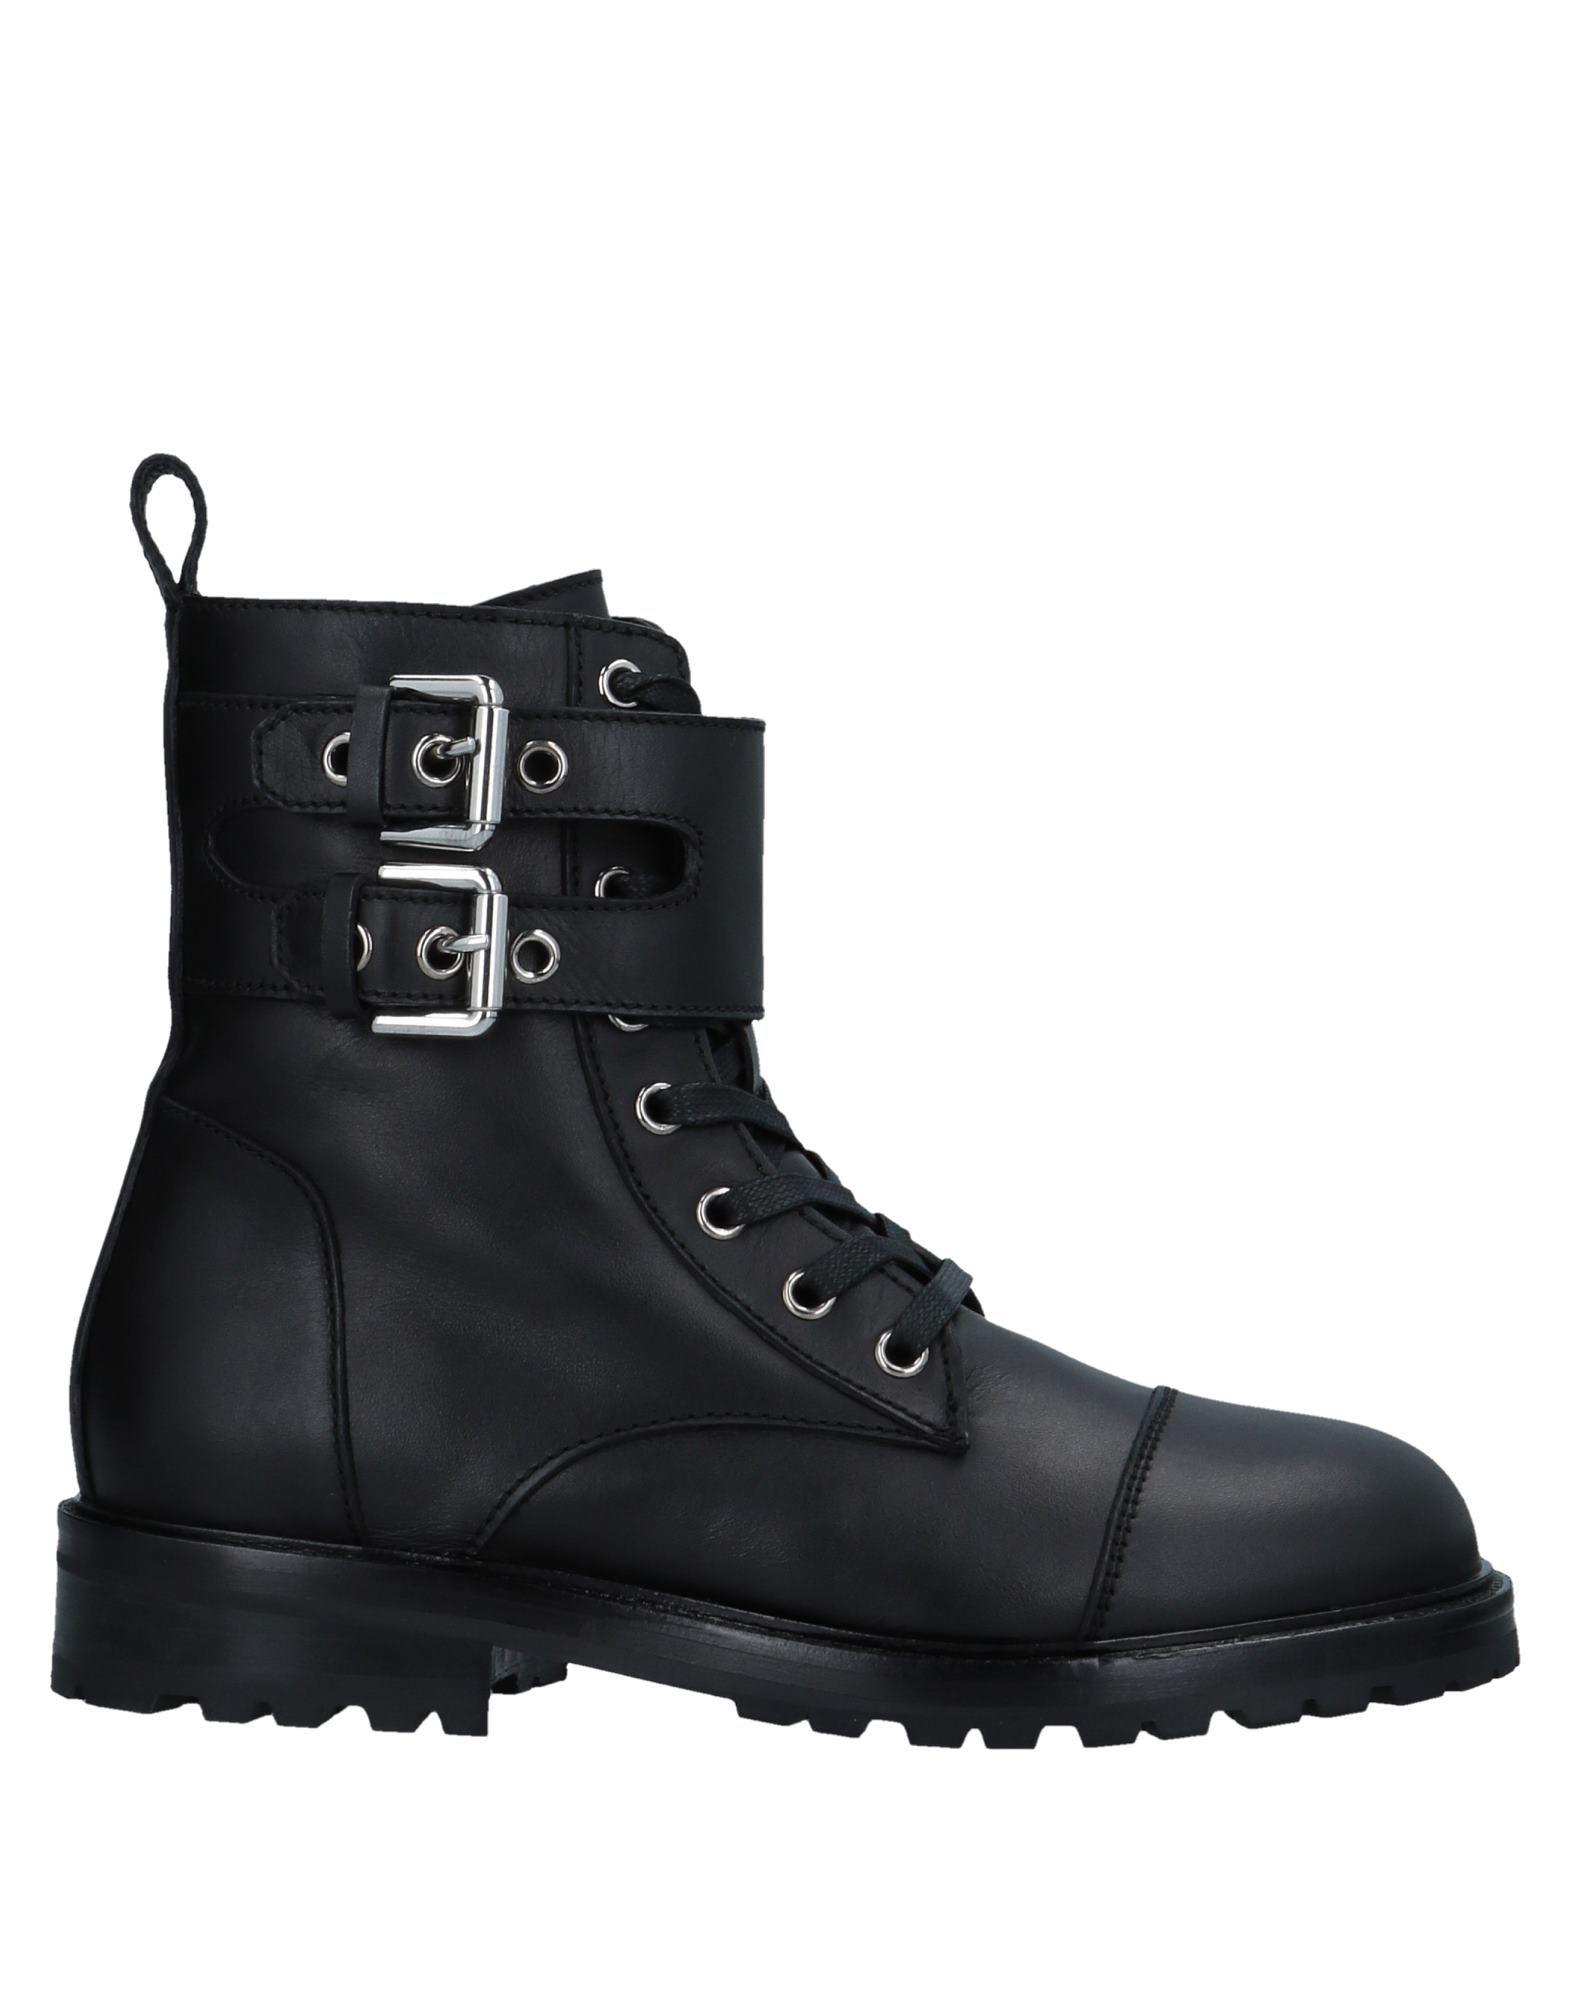 Diesel Black Women Gold Ankle Boot - Women Black Diesel Black Gold Ankle Boots online on  Australia - 11533090XD bcc2ca